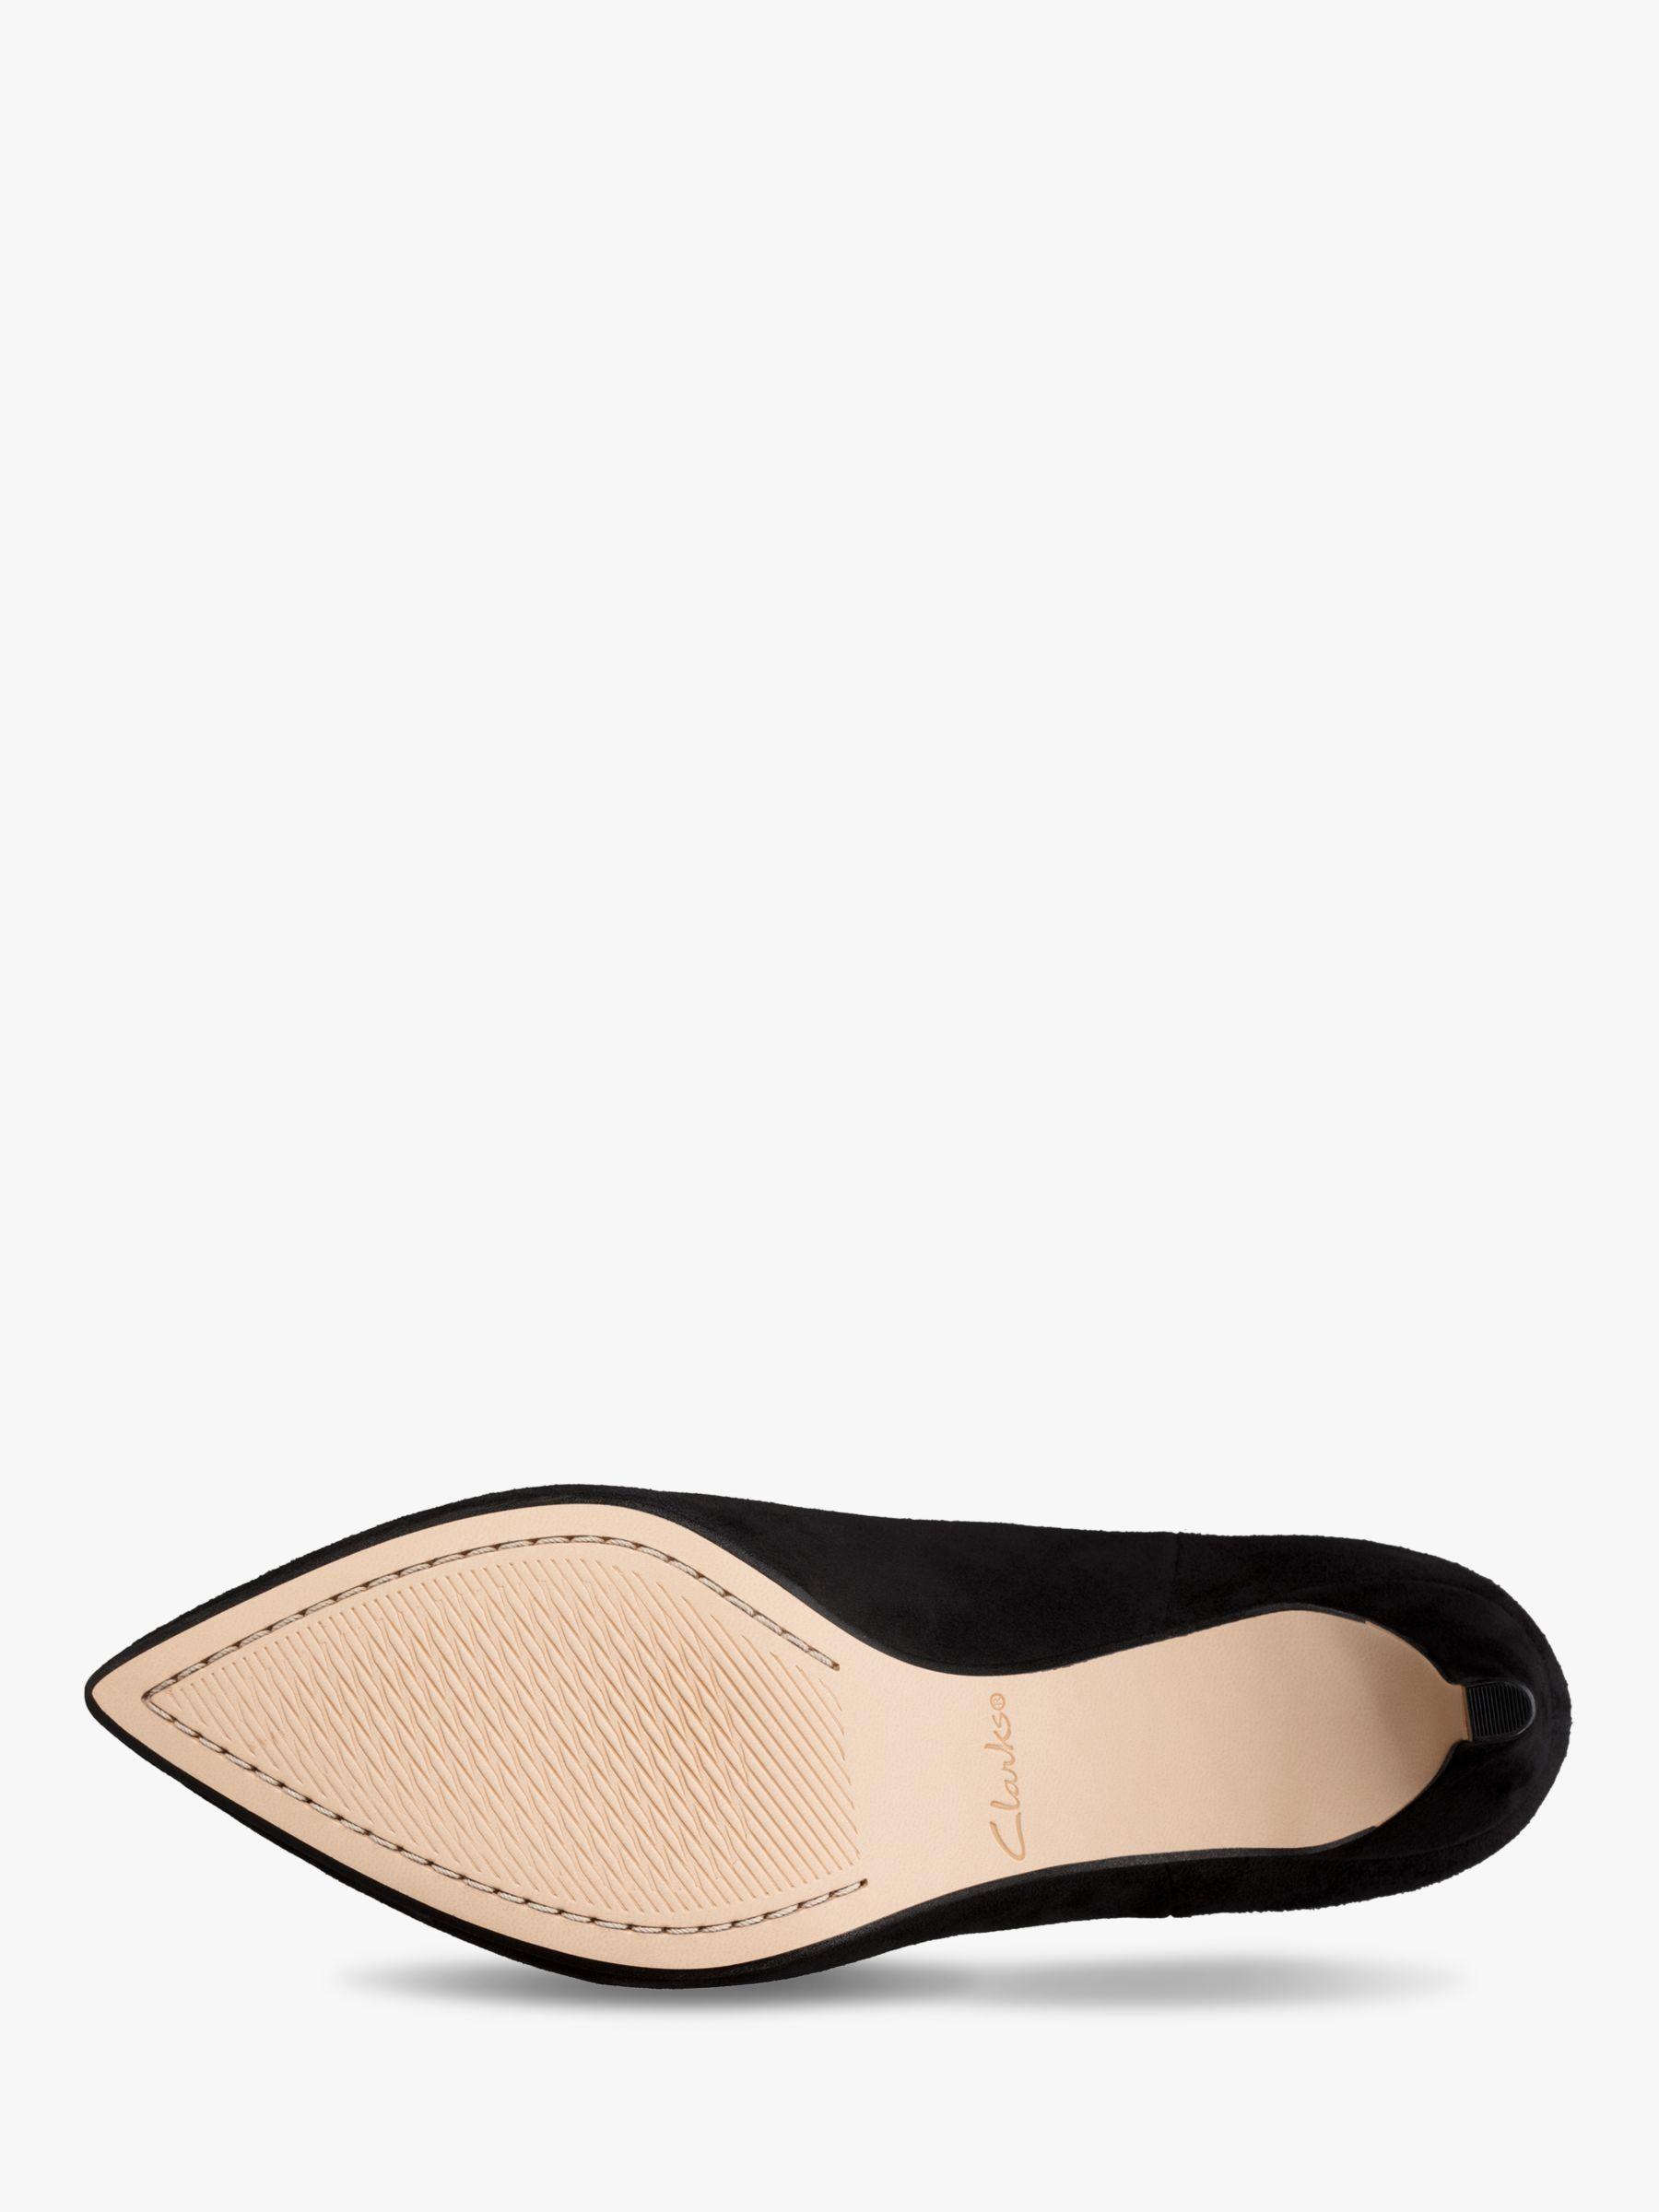 Clarks Laina 55 Kitten Heel Suede Ankle Boots Black In 2020 Black Ankle Boots Suede Ankle Boots Boots